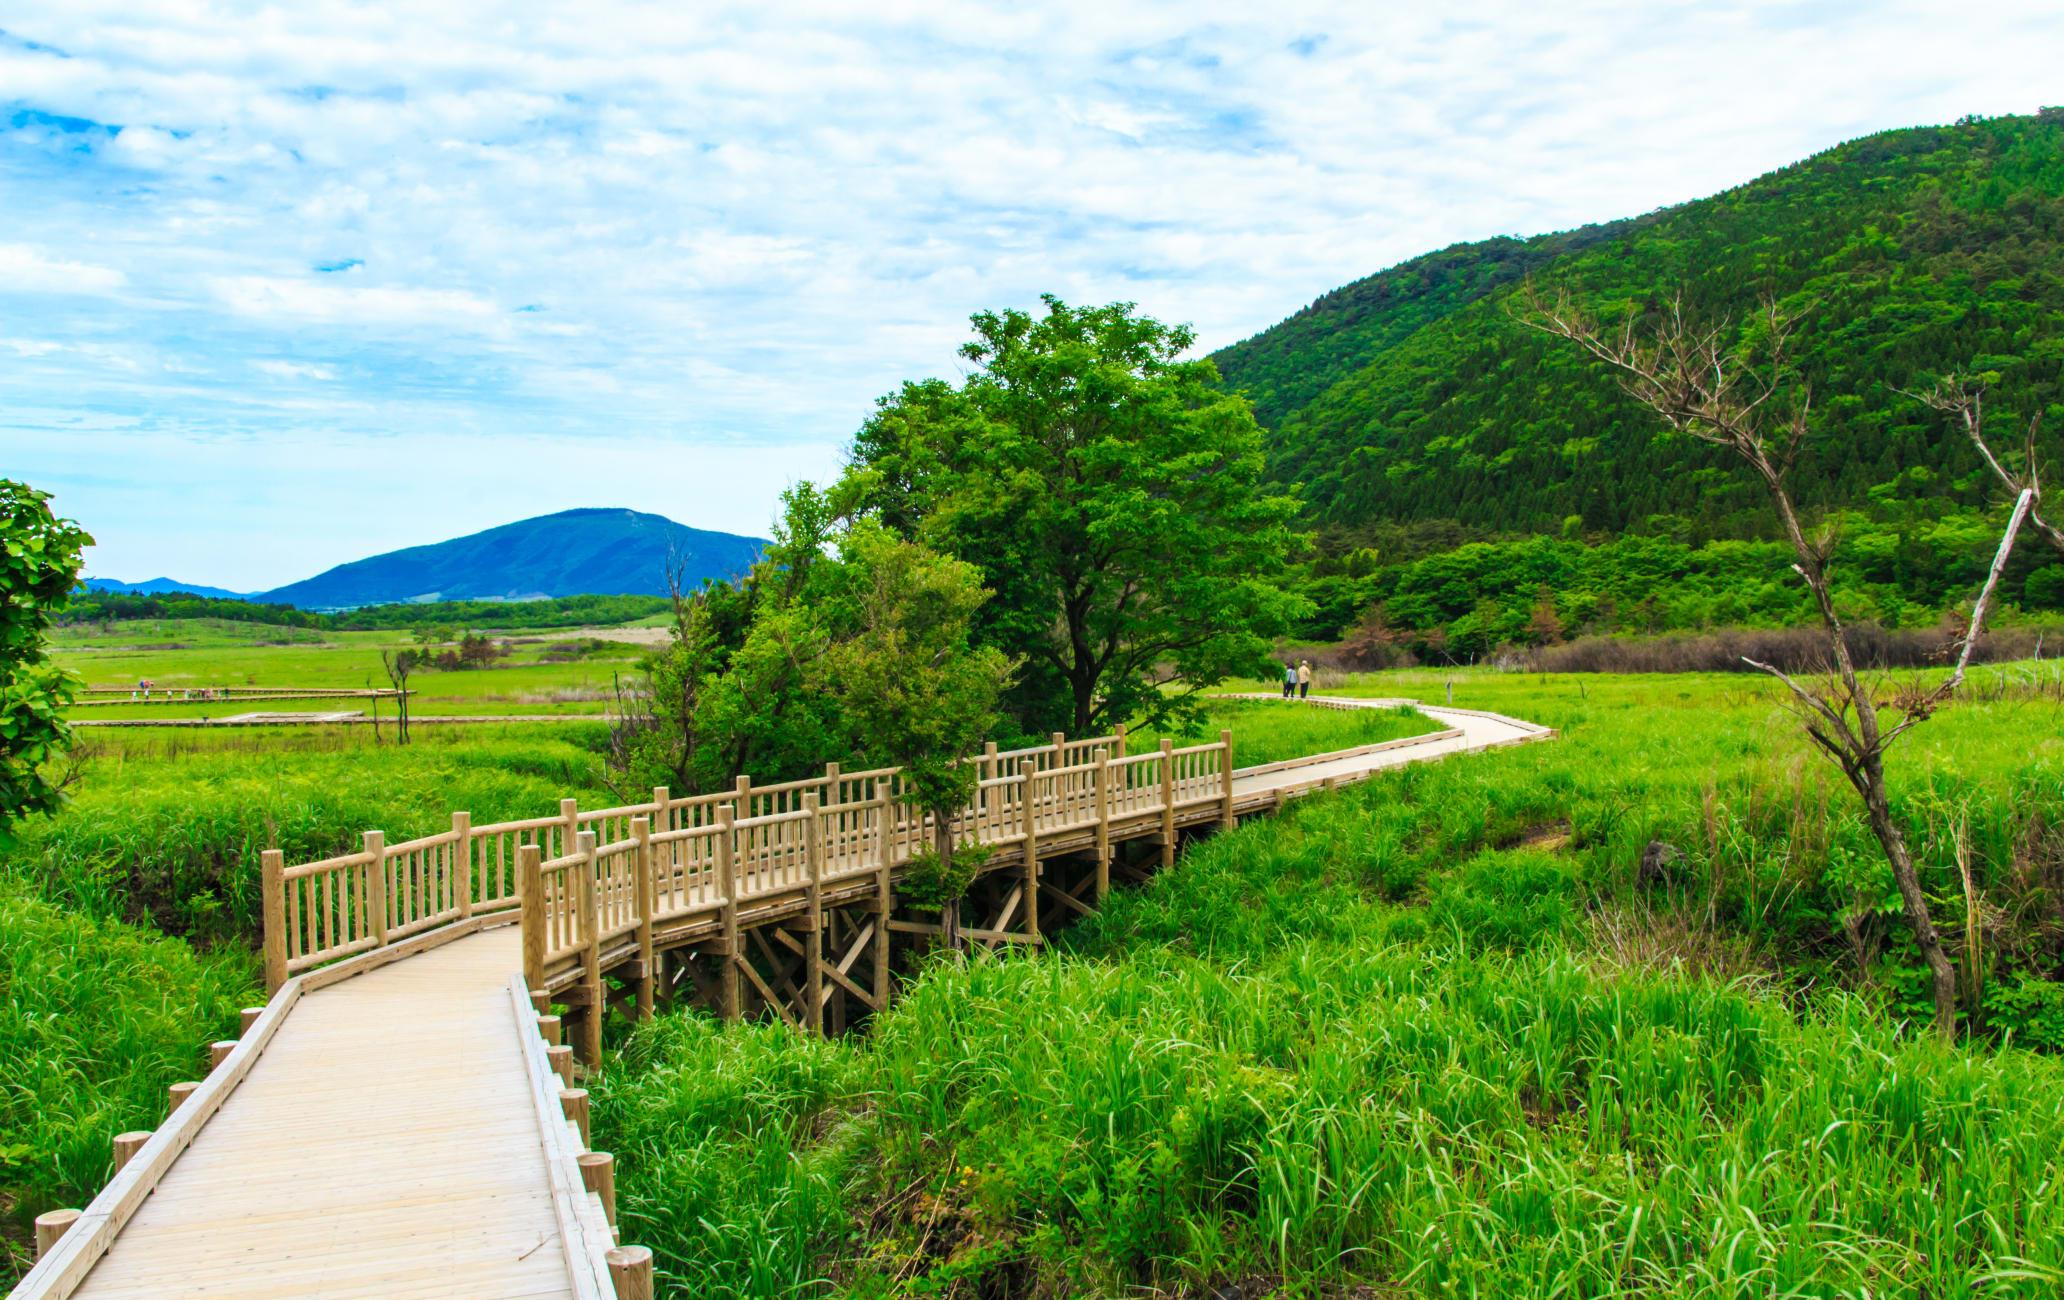 Tadewara Marshland and Bougatsuru Wetland and Chojabaru Visitor Center